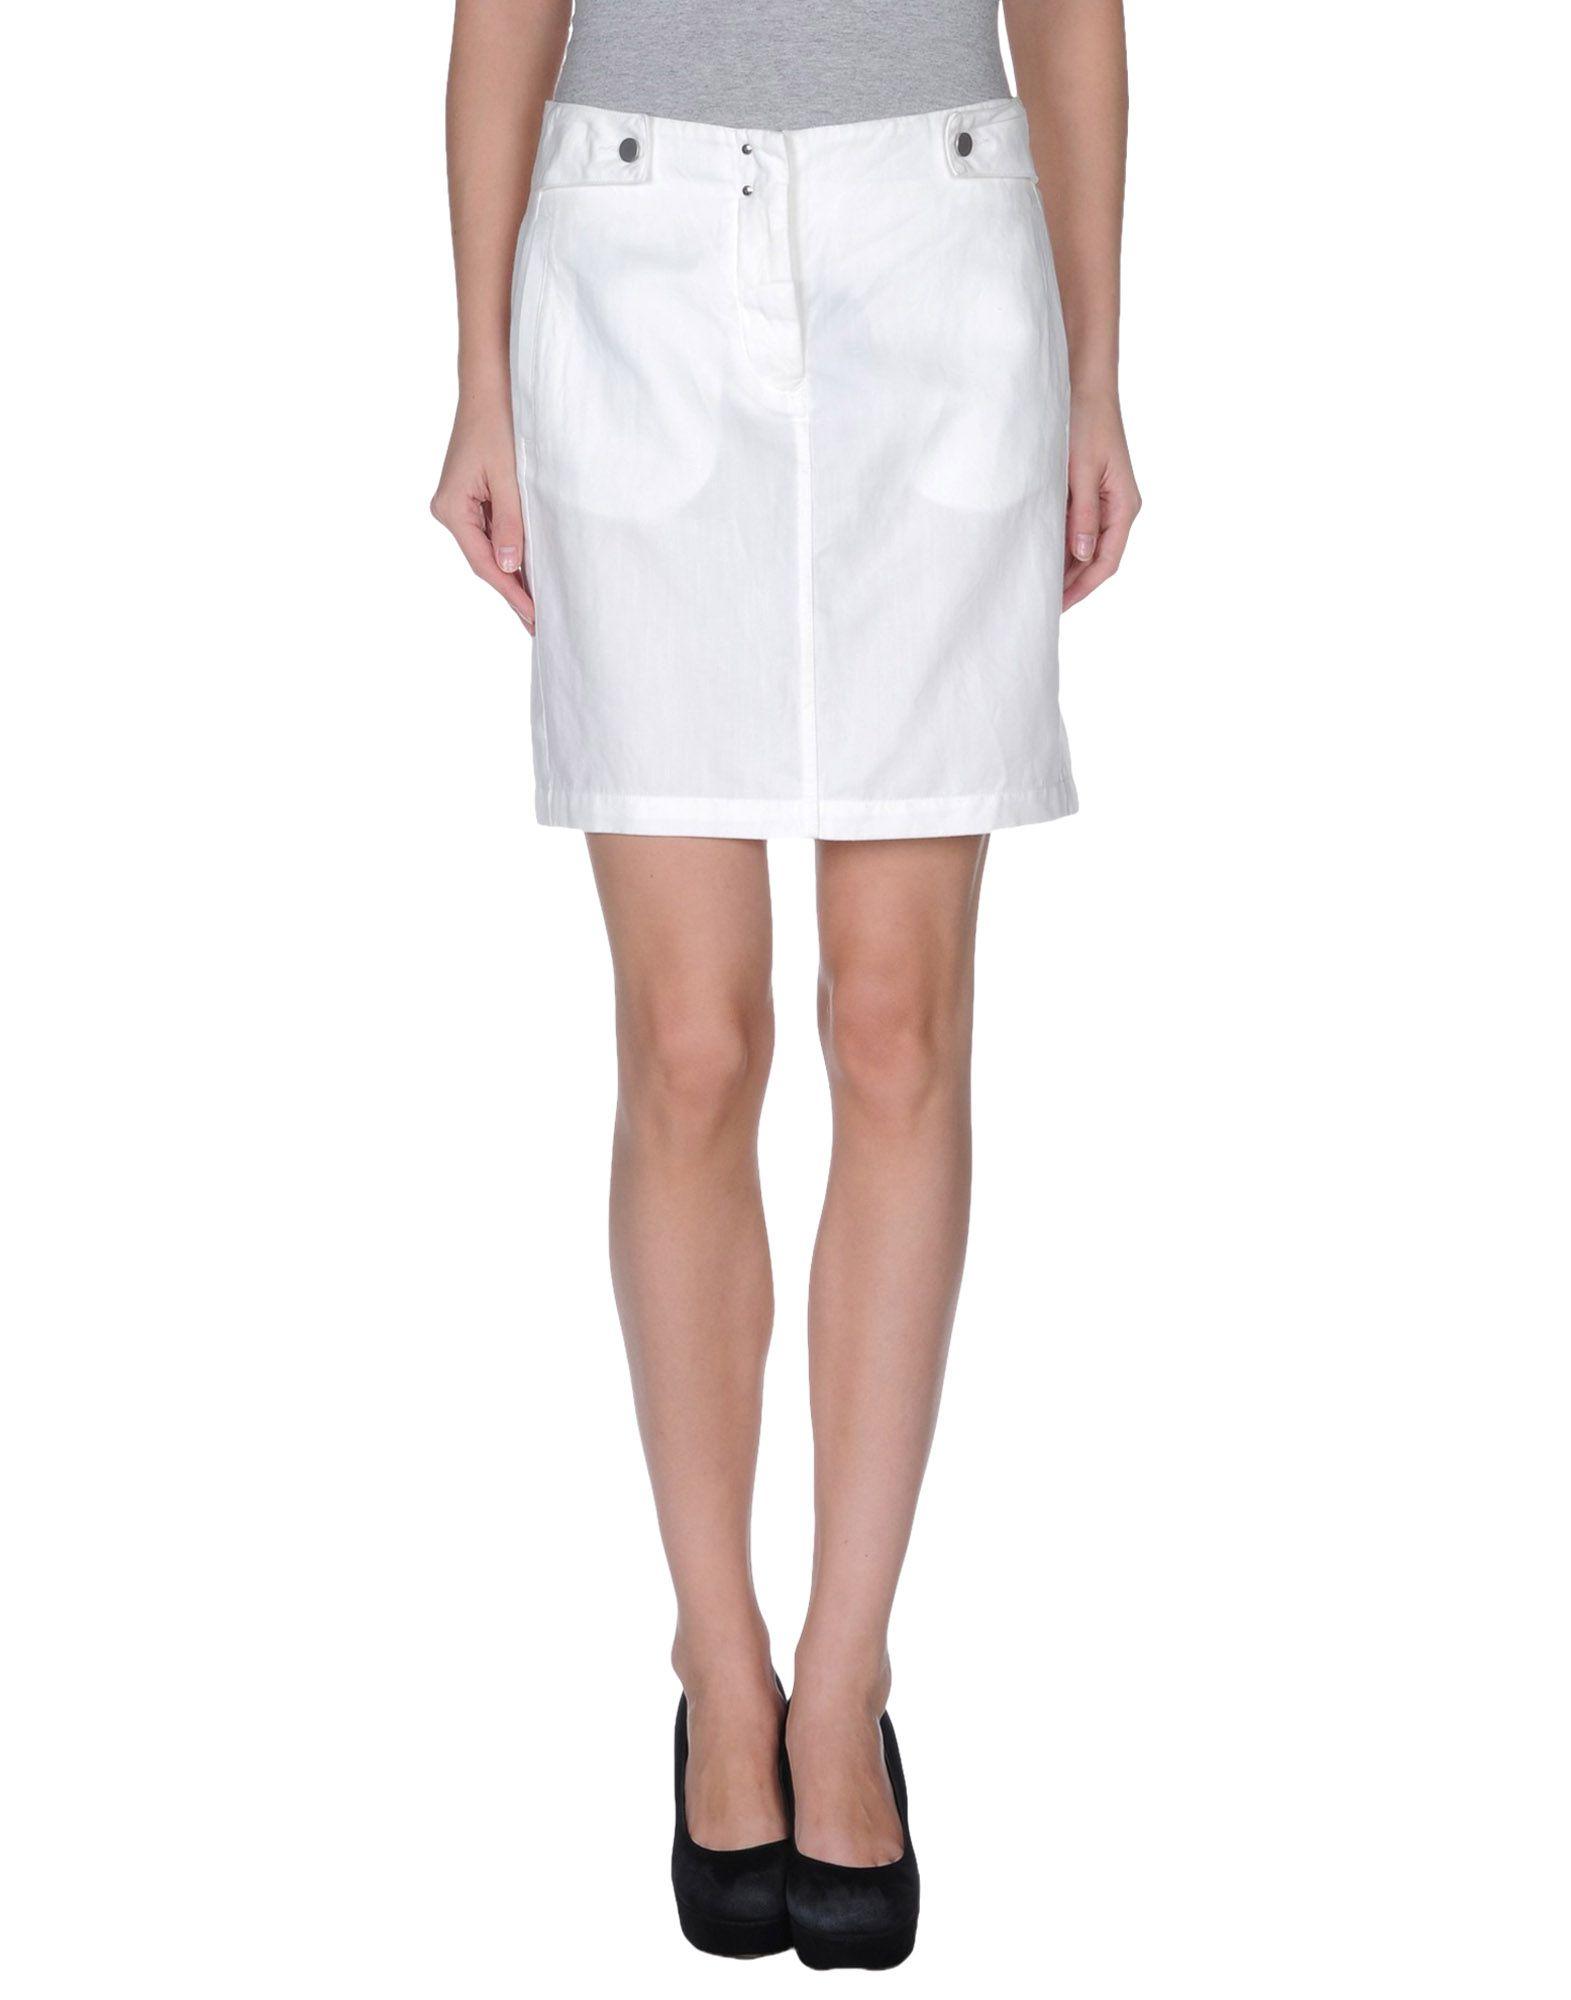 Mm6 by maison martin margiela mini skirt in white lyst for 10 moulmein rise la maison